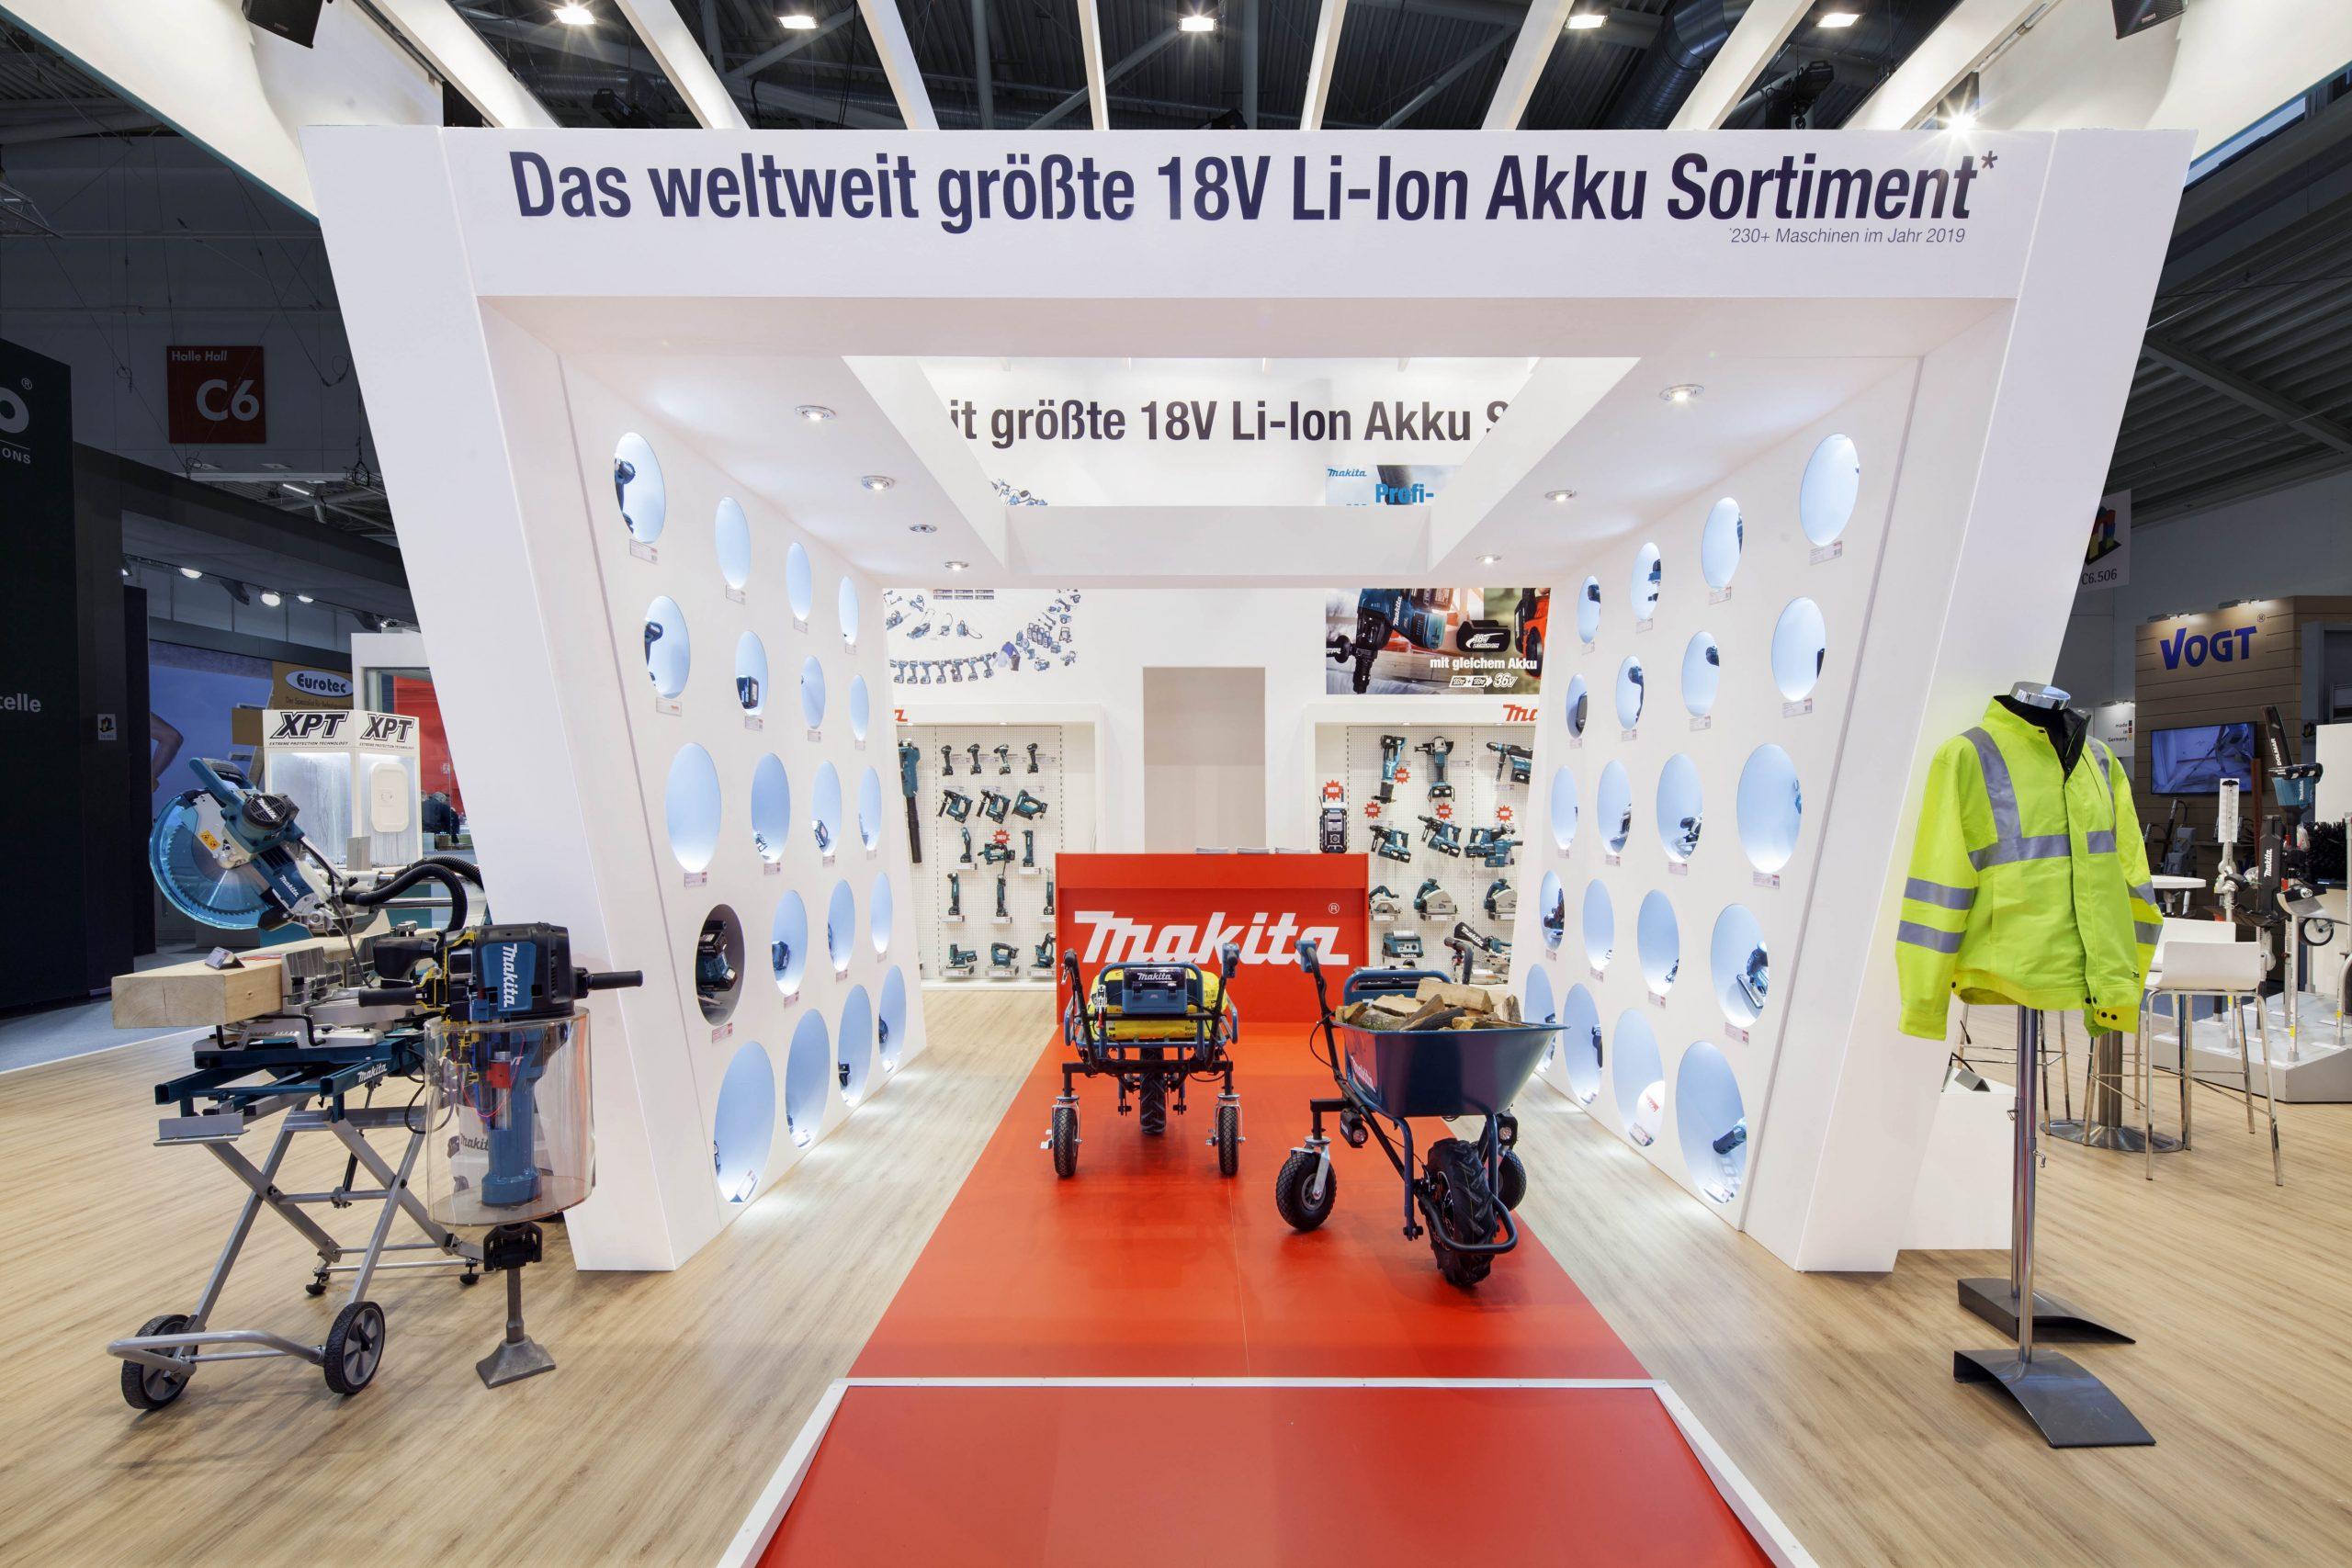 The Inside - Makita - BAU 2019 - München - Standbouwfotografie #5268(lr)